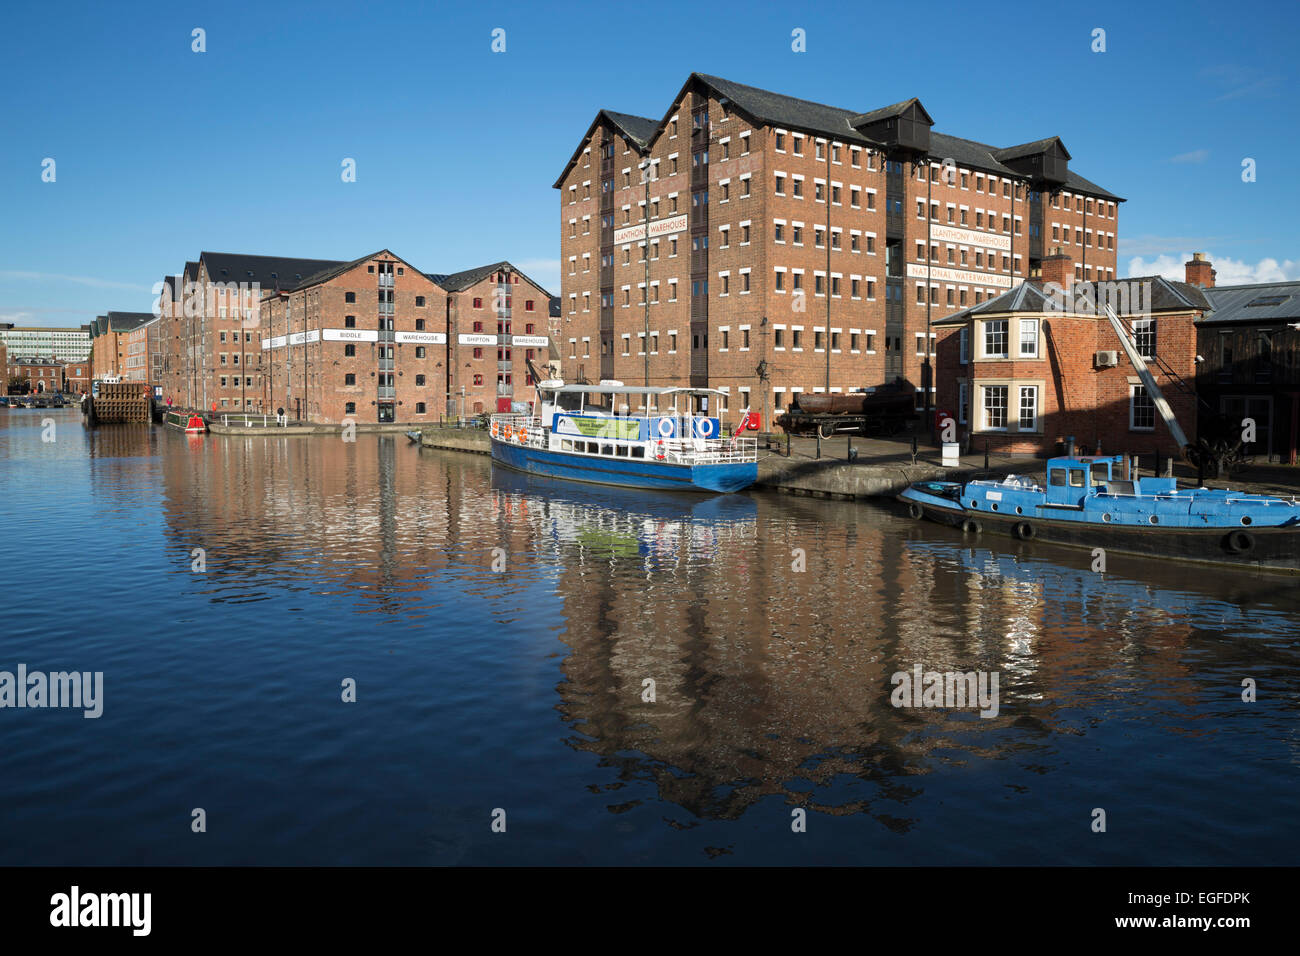 Former warehouses, Gloucester Quays, Gloucester, Gloucestershire, England, United Kingdom, Europe - Stock Image